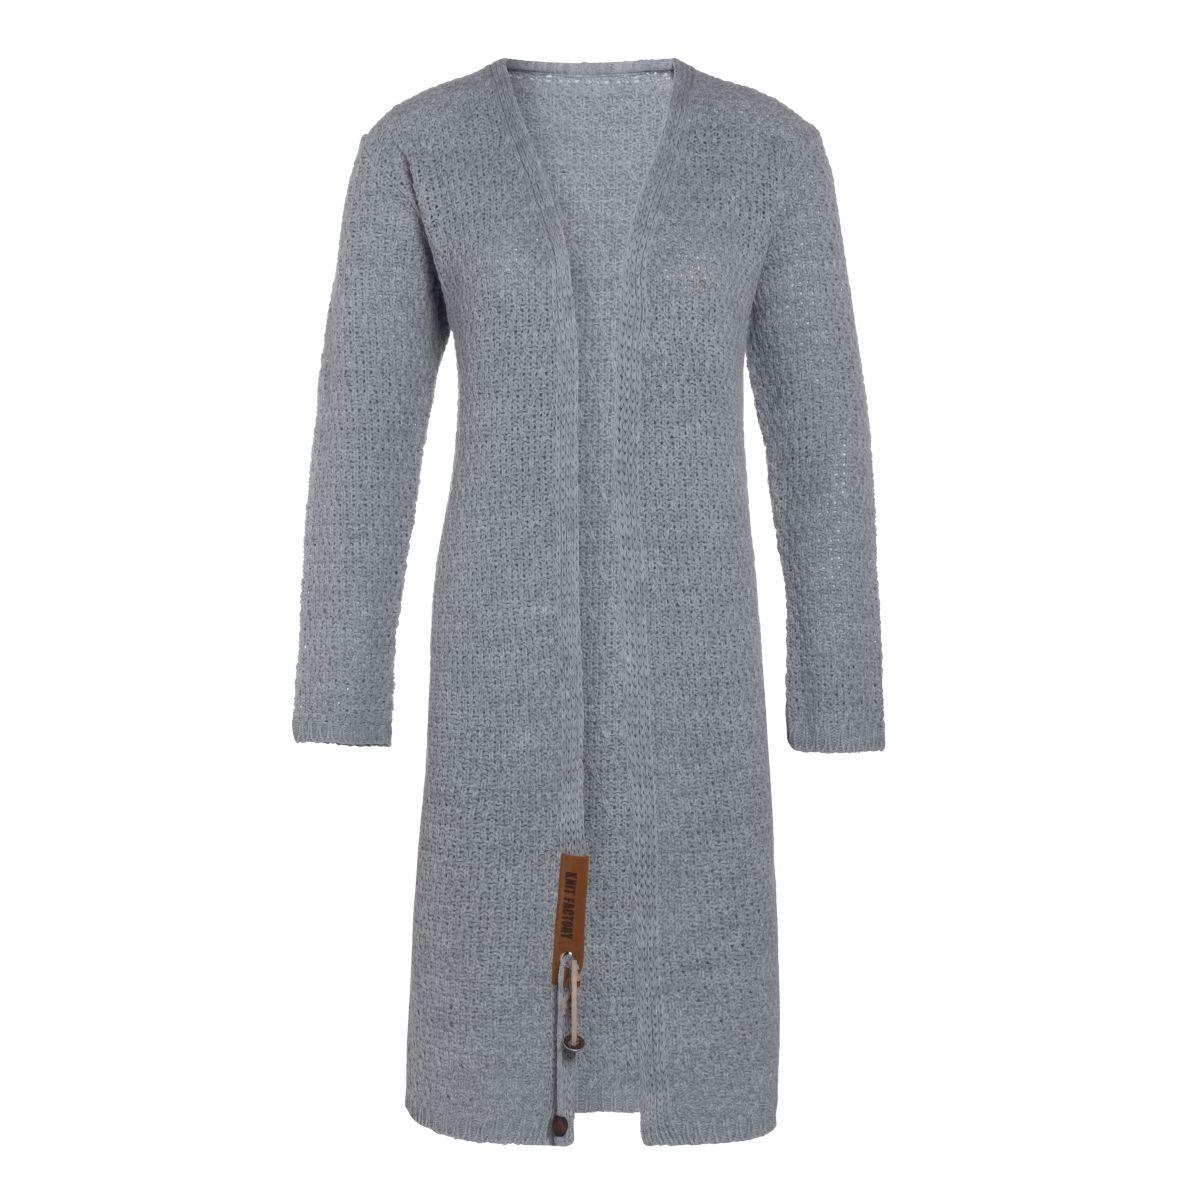 luna long knitted cardigan light grey 3638